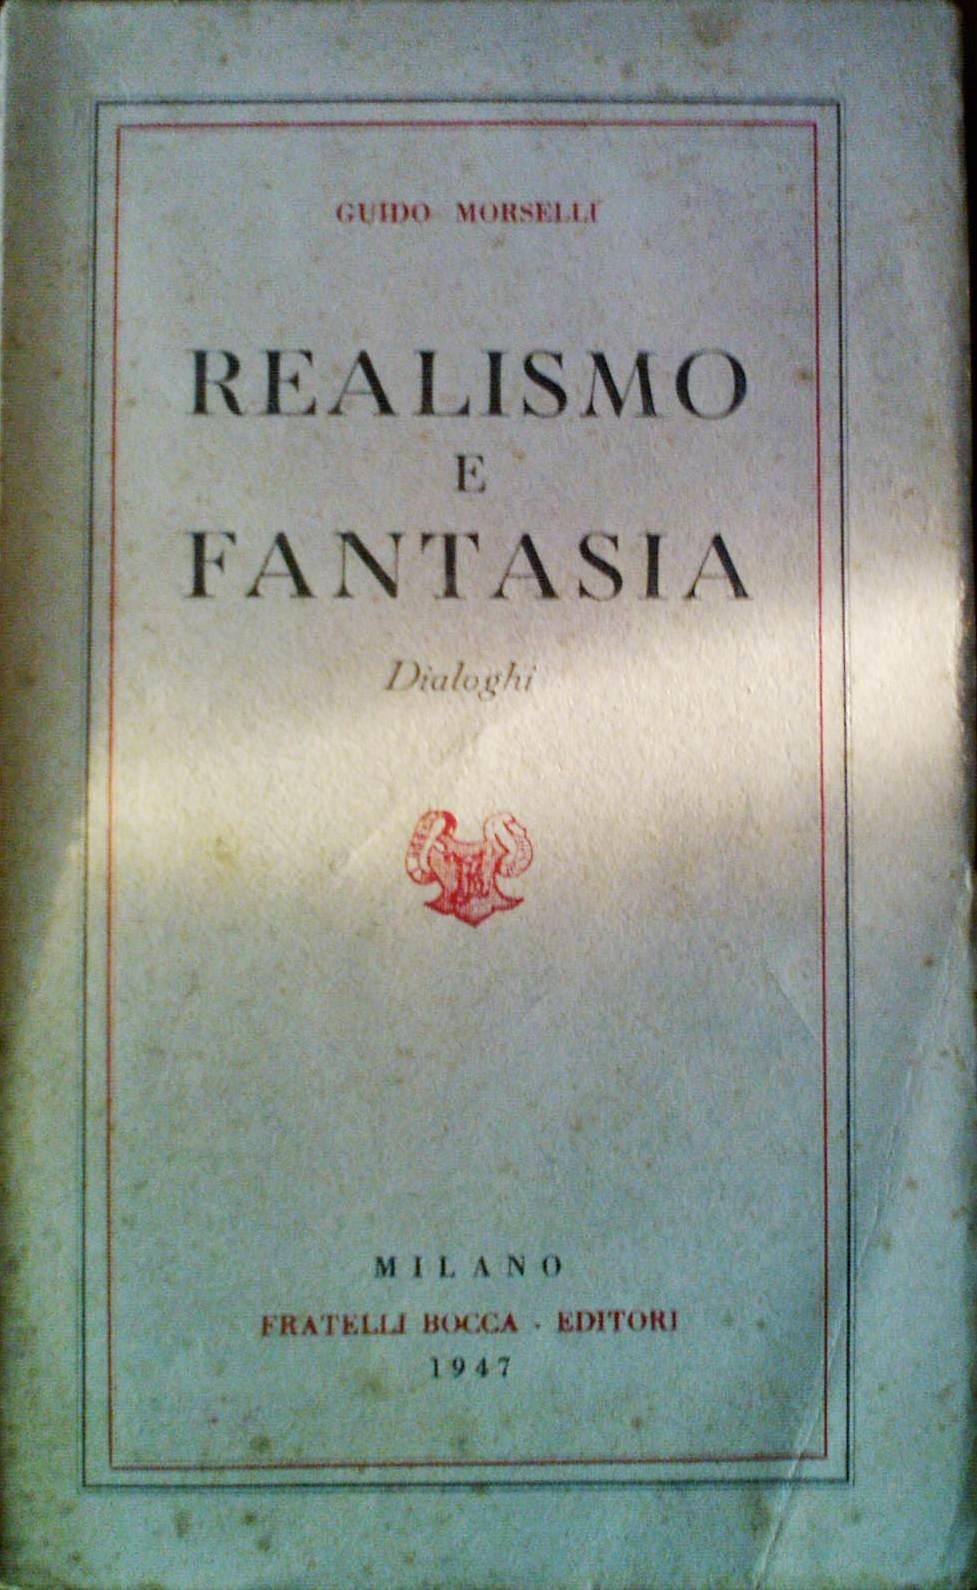 Realismo e fantasia